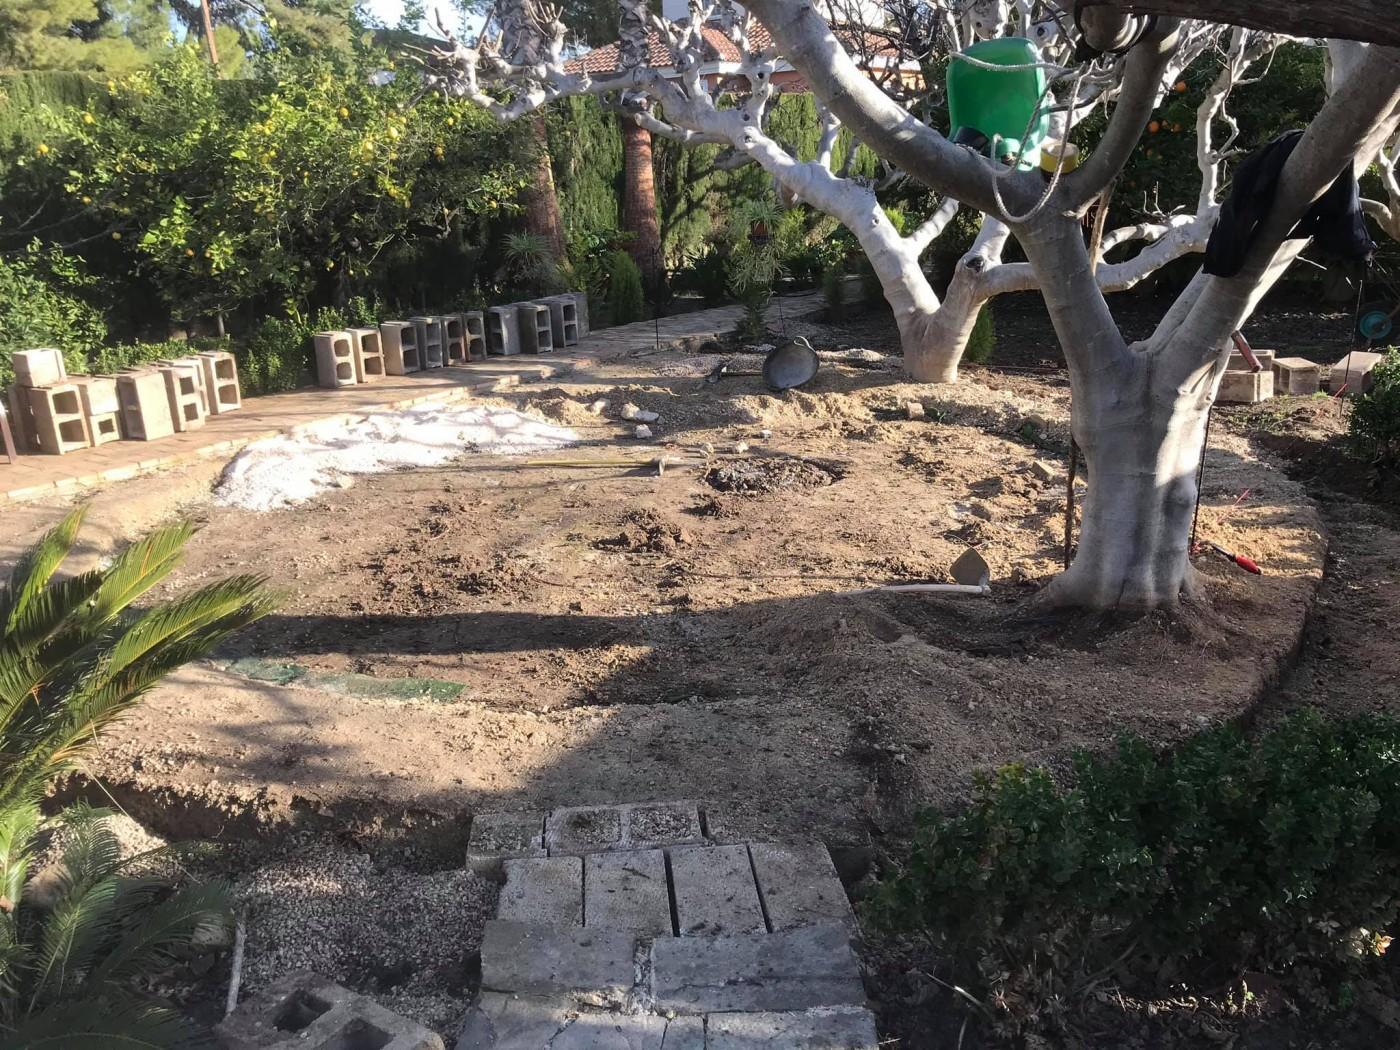 Encina Gardening Services: garden landscaping, maintenance, pruning